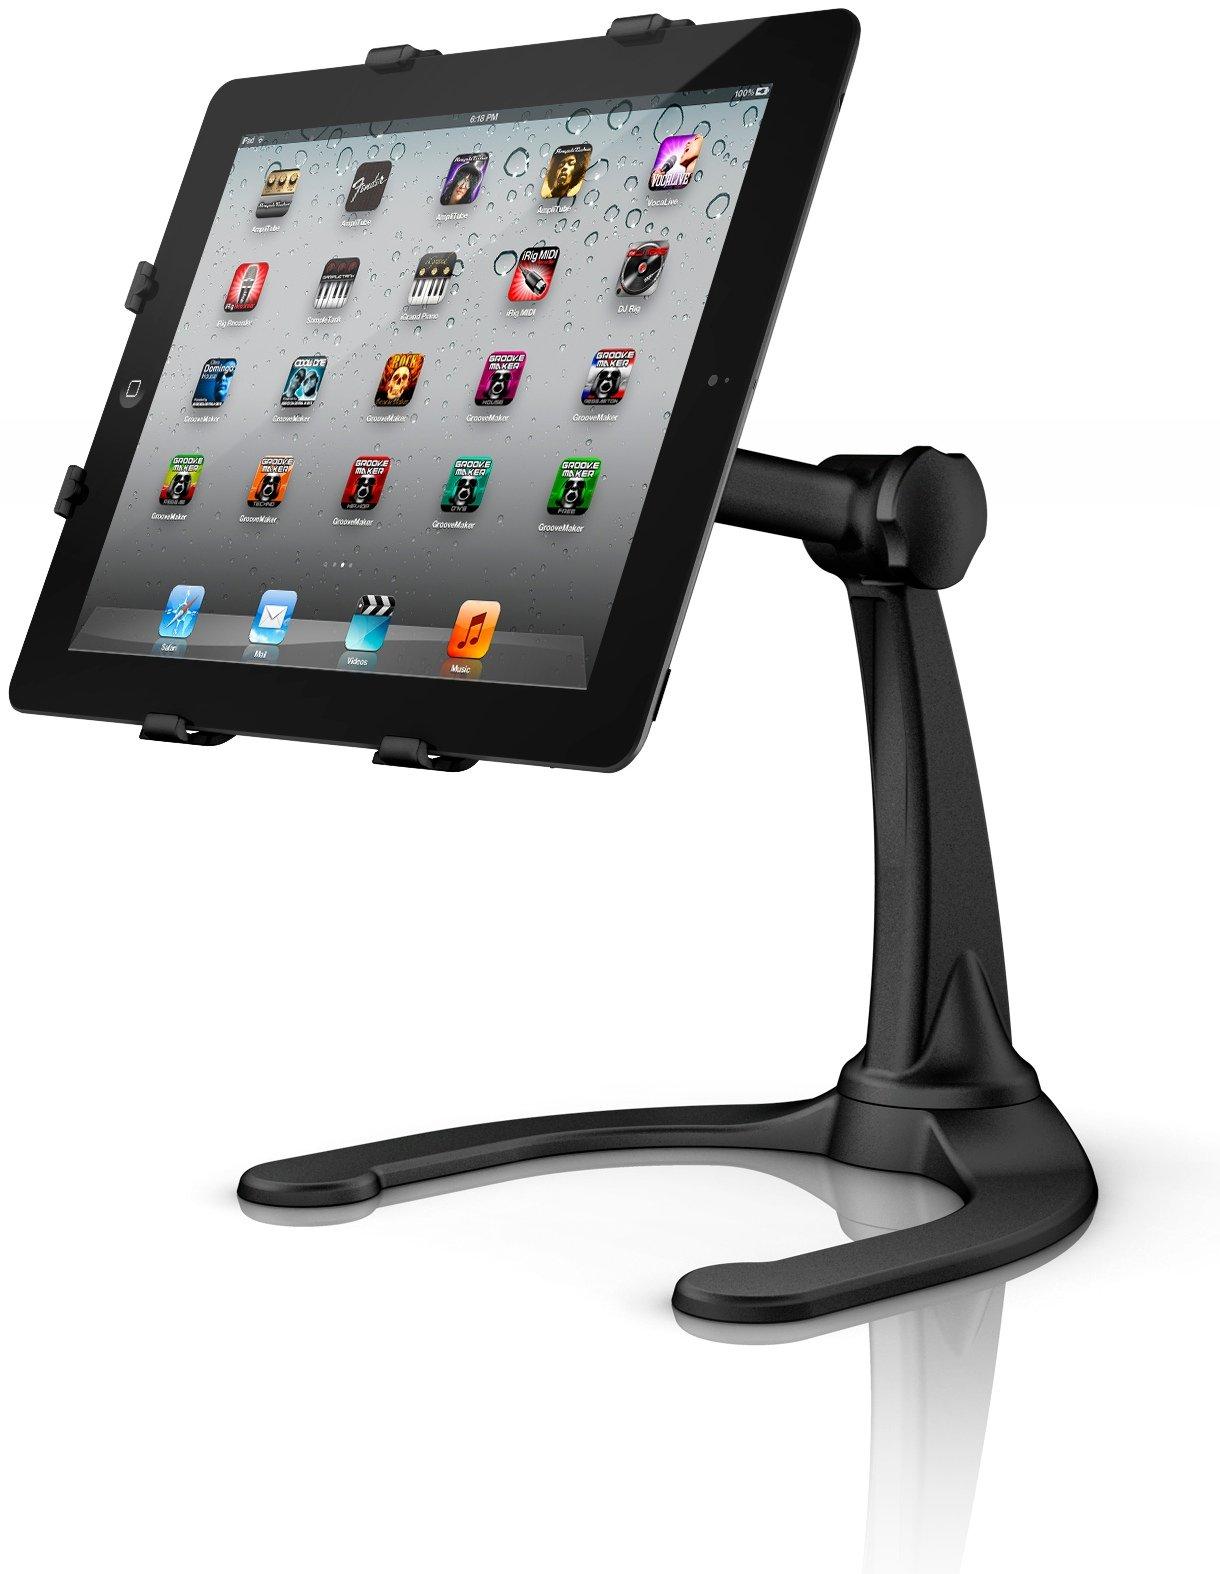 Ik Multia Iklip Stand Desktop For Ipad Mini Image 1